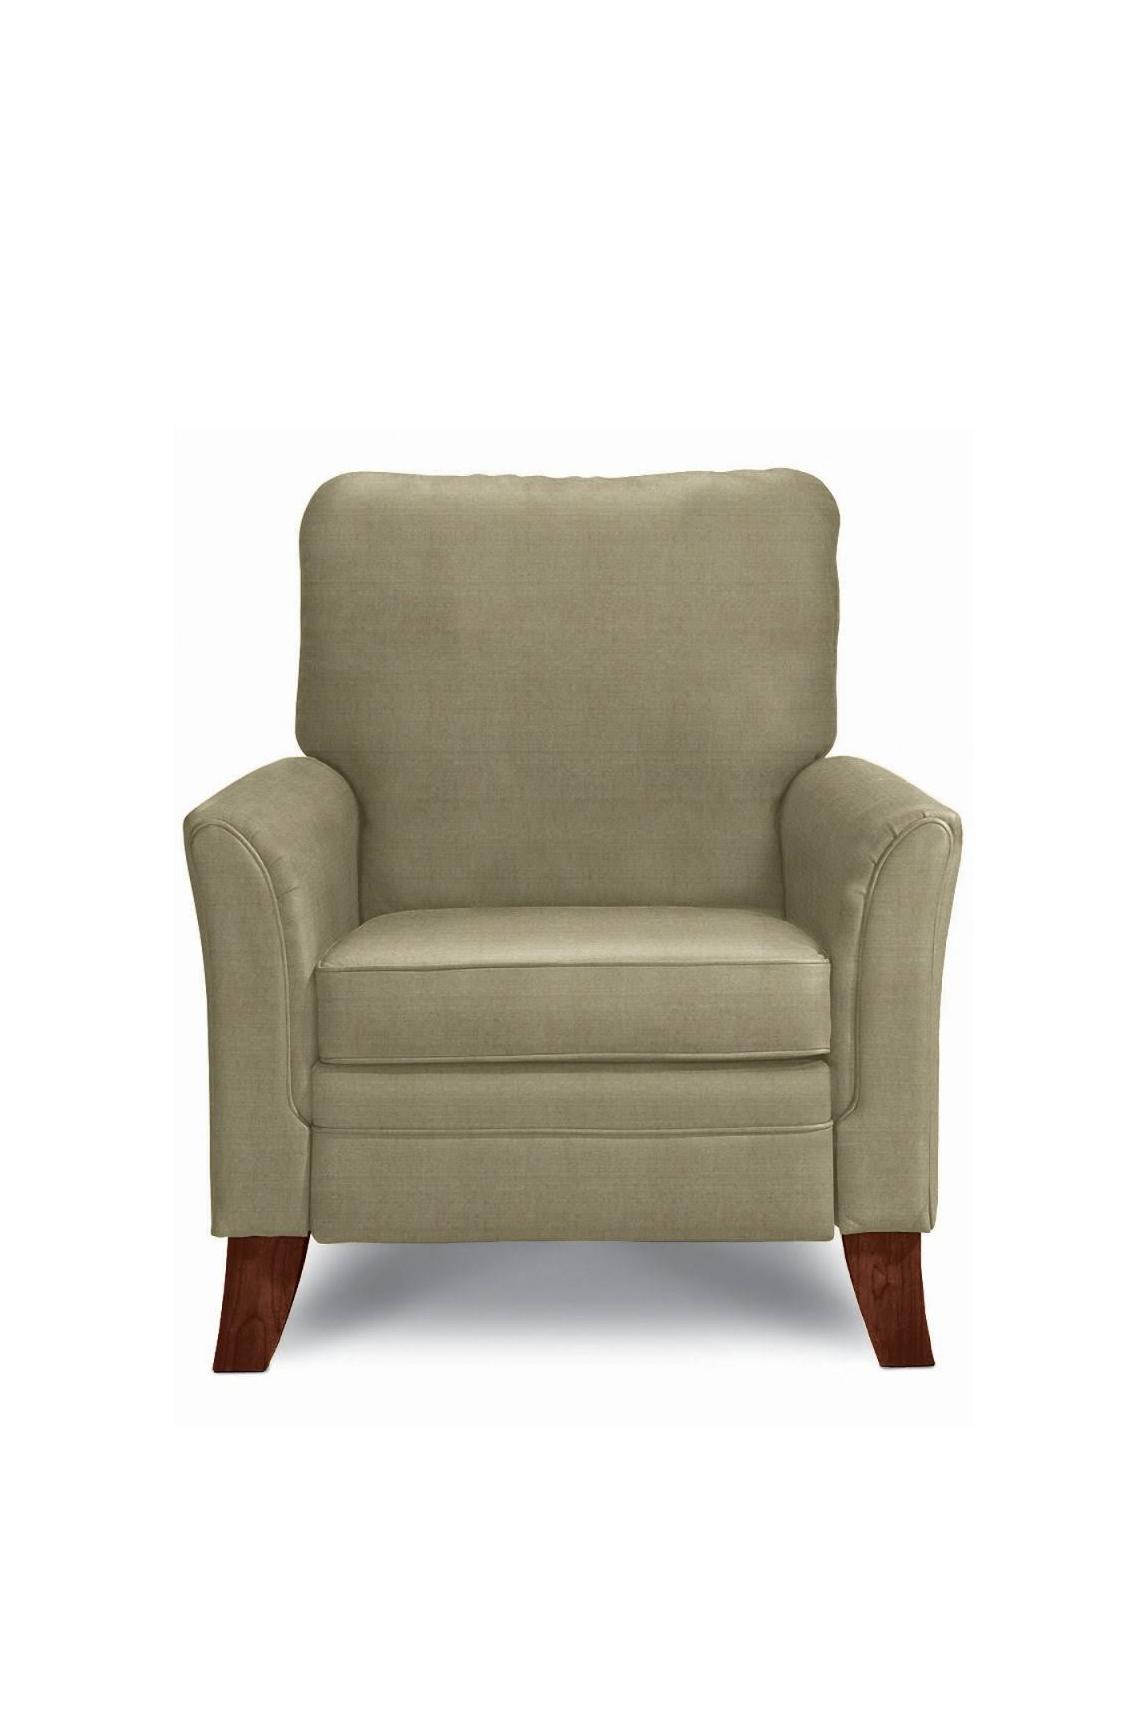 100 Stylish Recliner Stylish Design Living Room Recliners